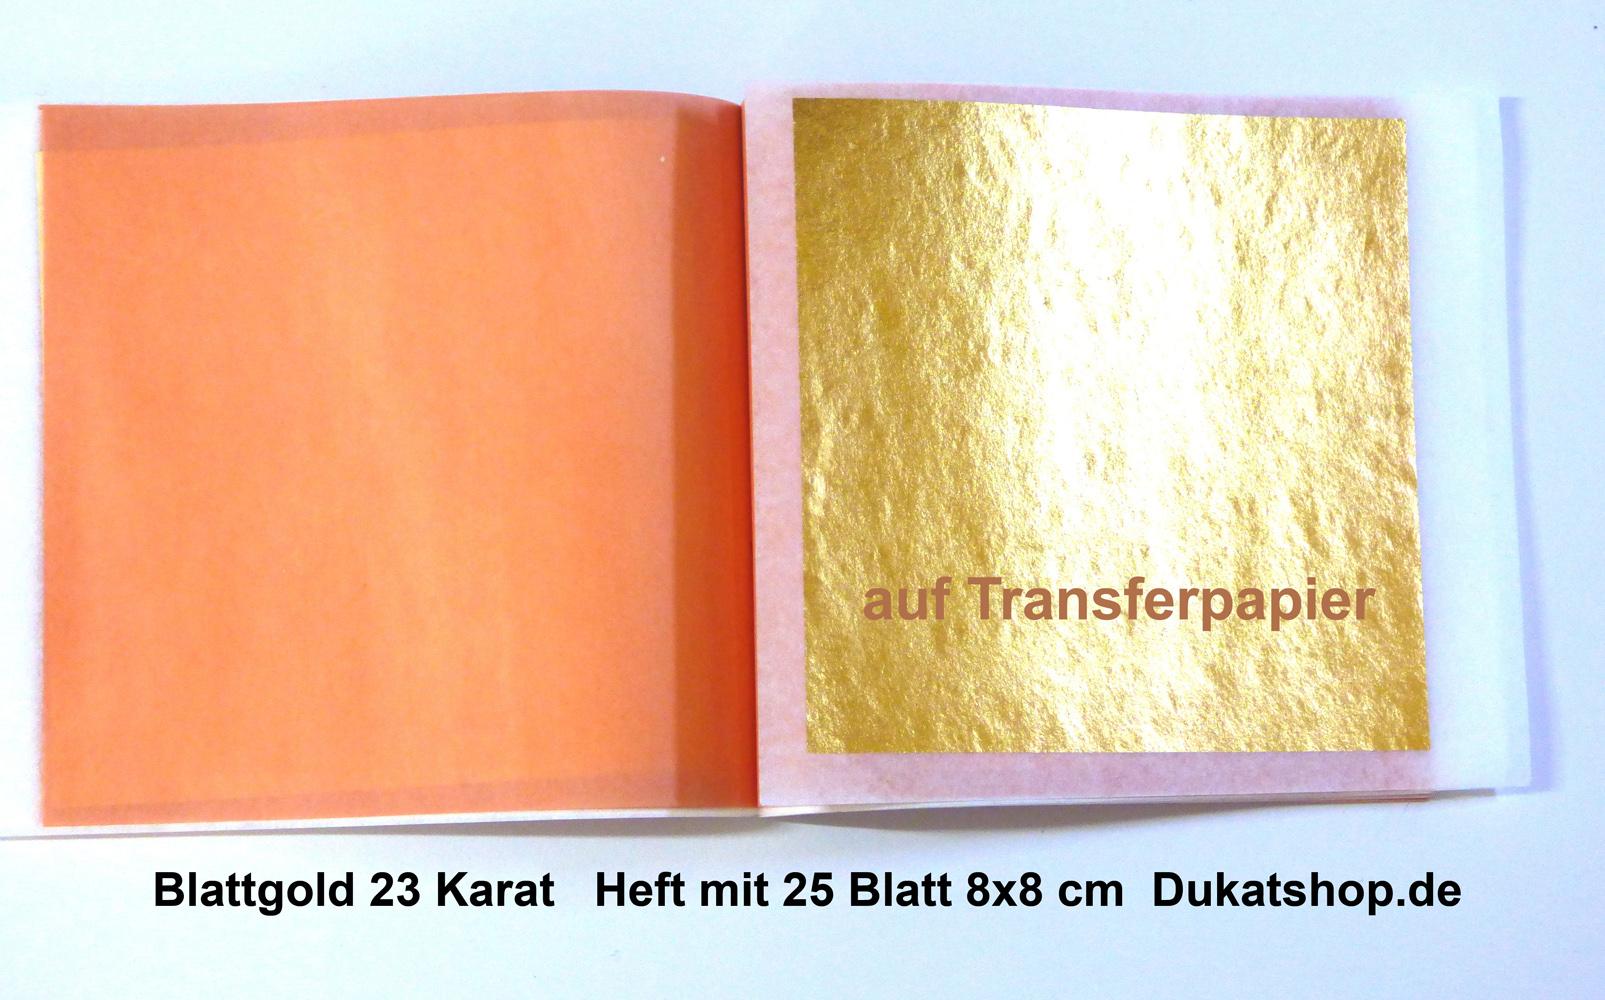 23 Karat 8x8 cm, 14 Gr., Dukat-Doppelgold, Transferpapier